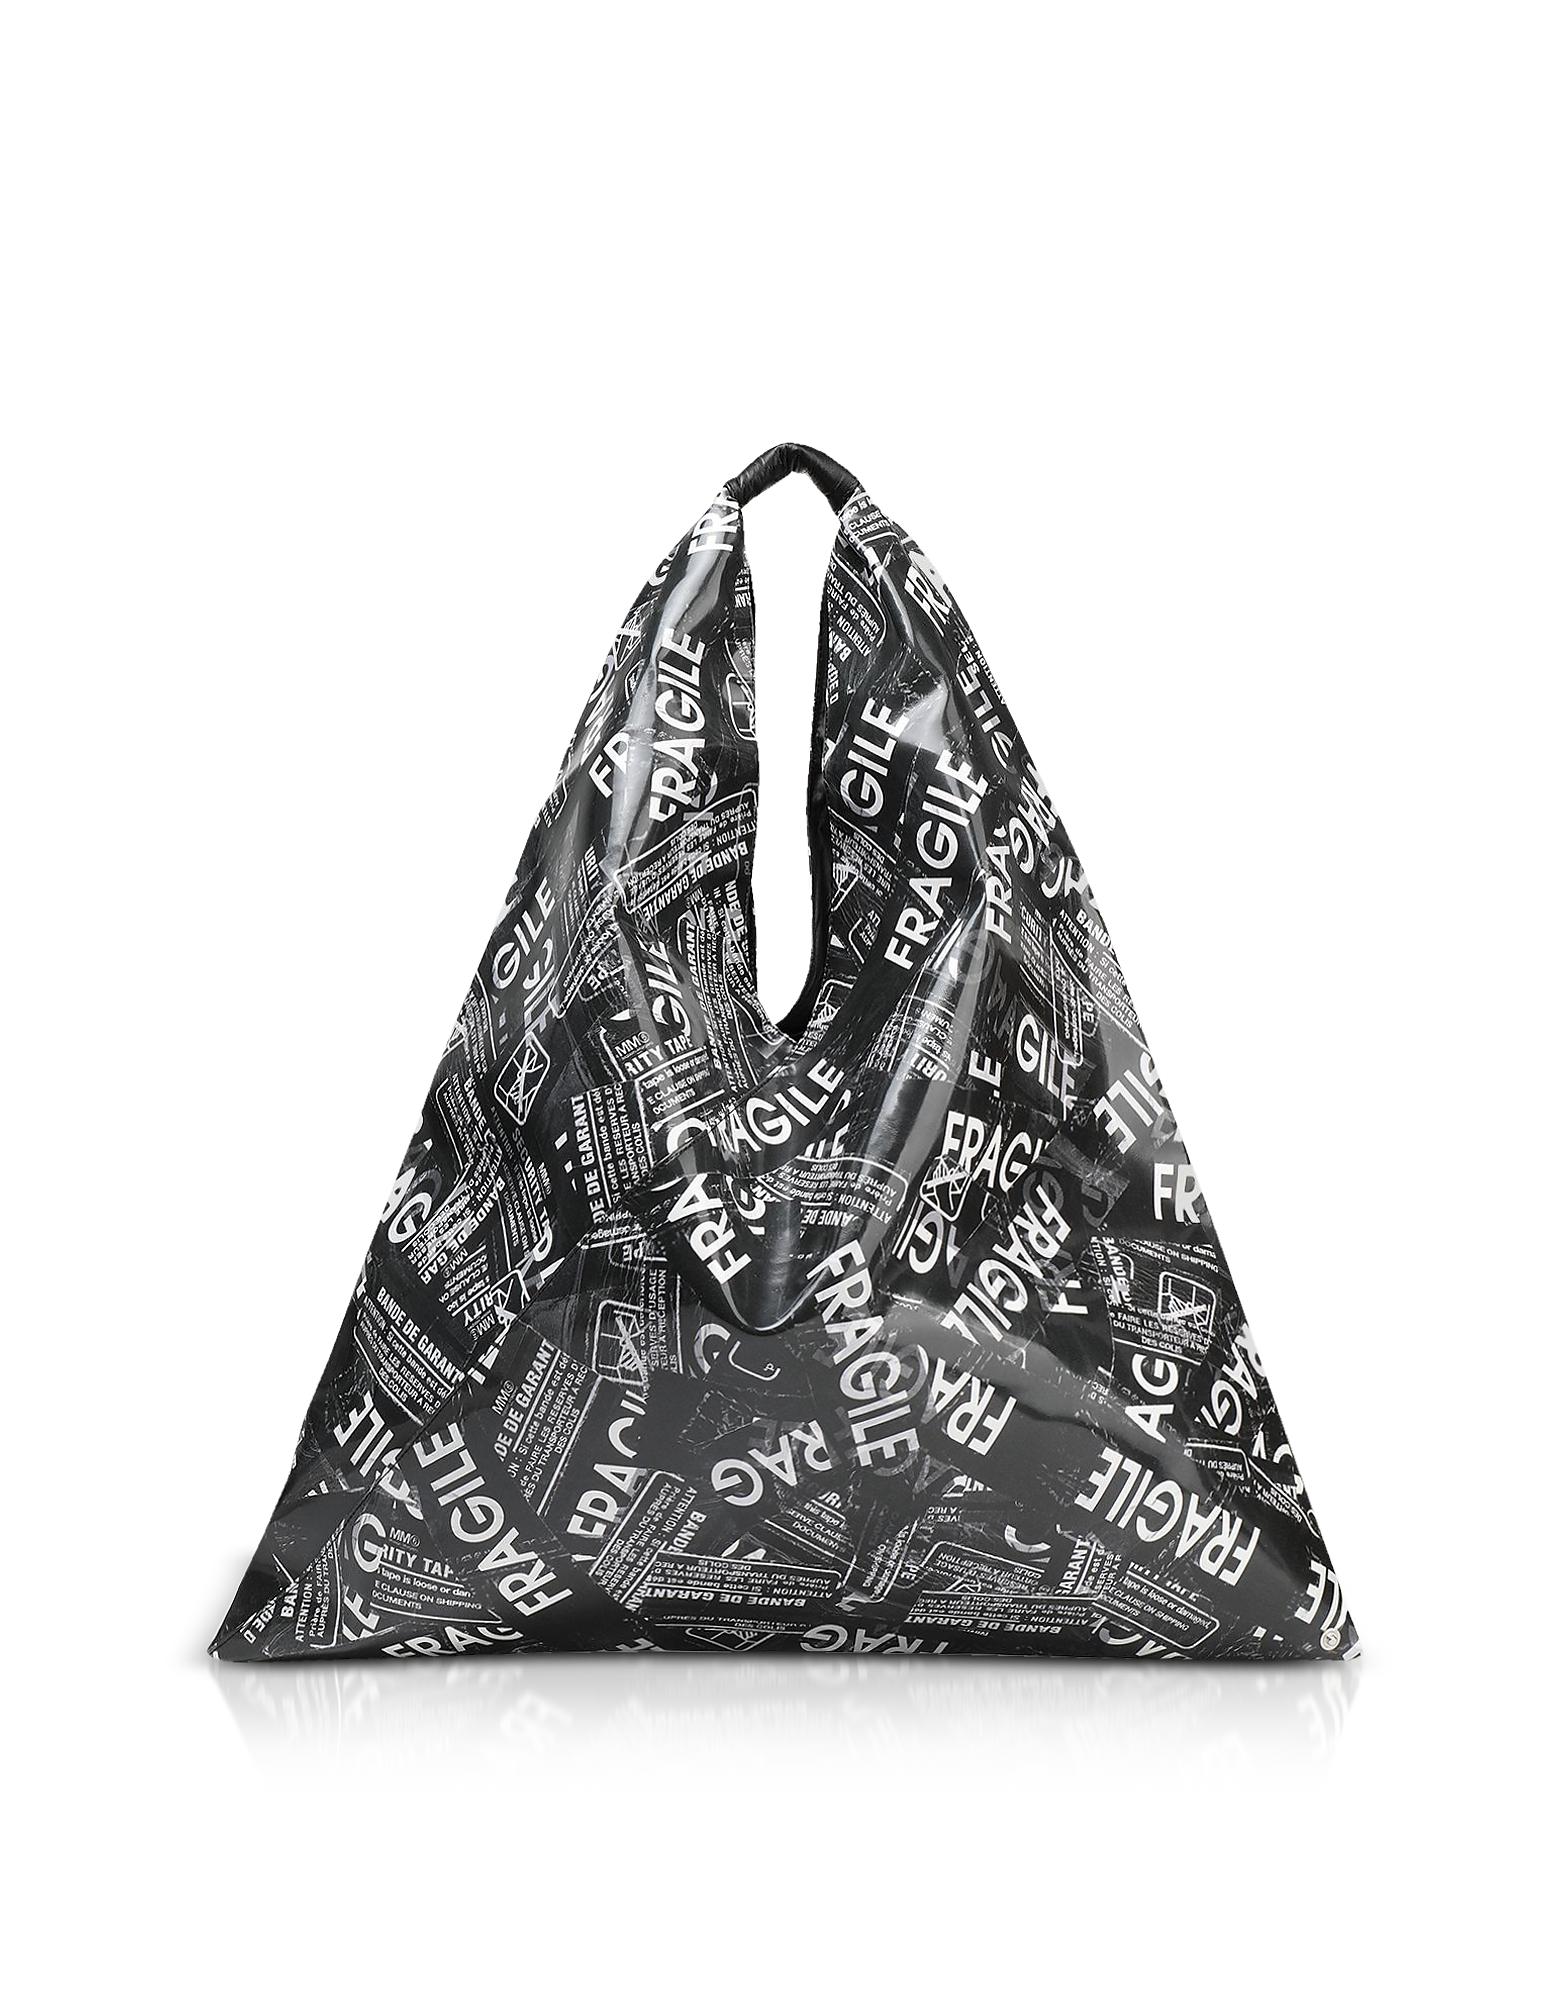 Image of MM6 Maison Martin Margiela Designer Handbags, Fragile Printed Japanese Tote Bag